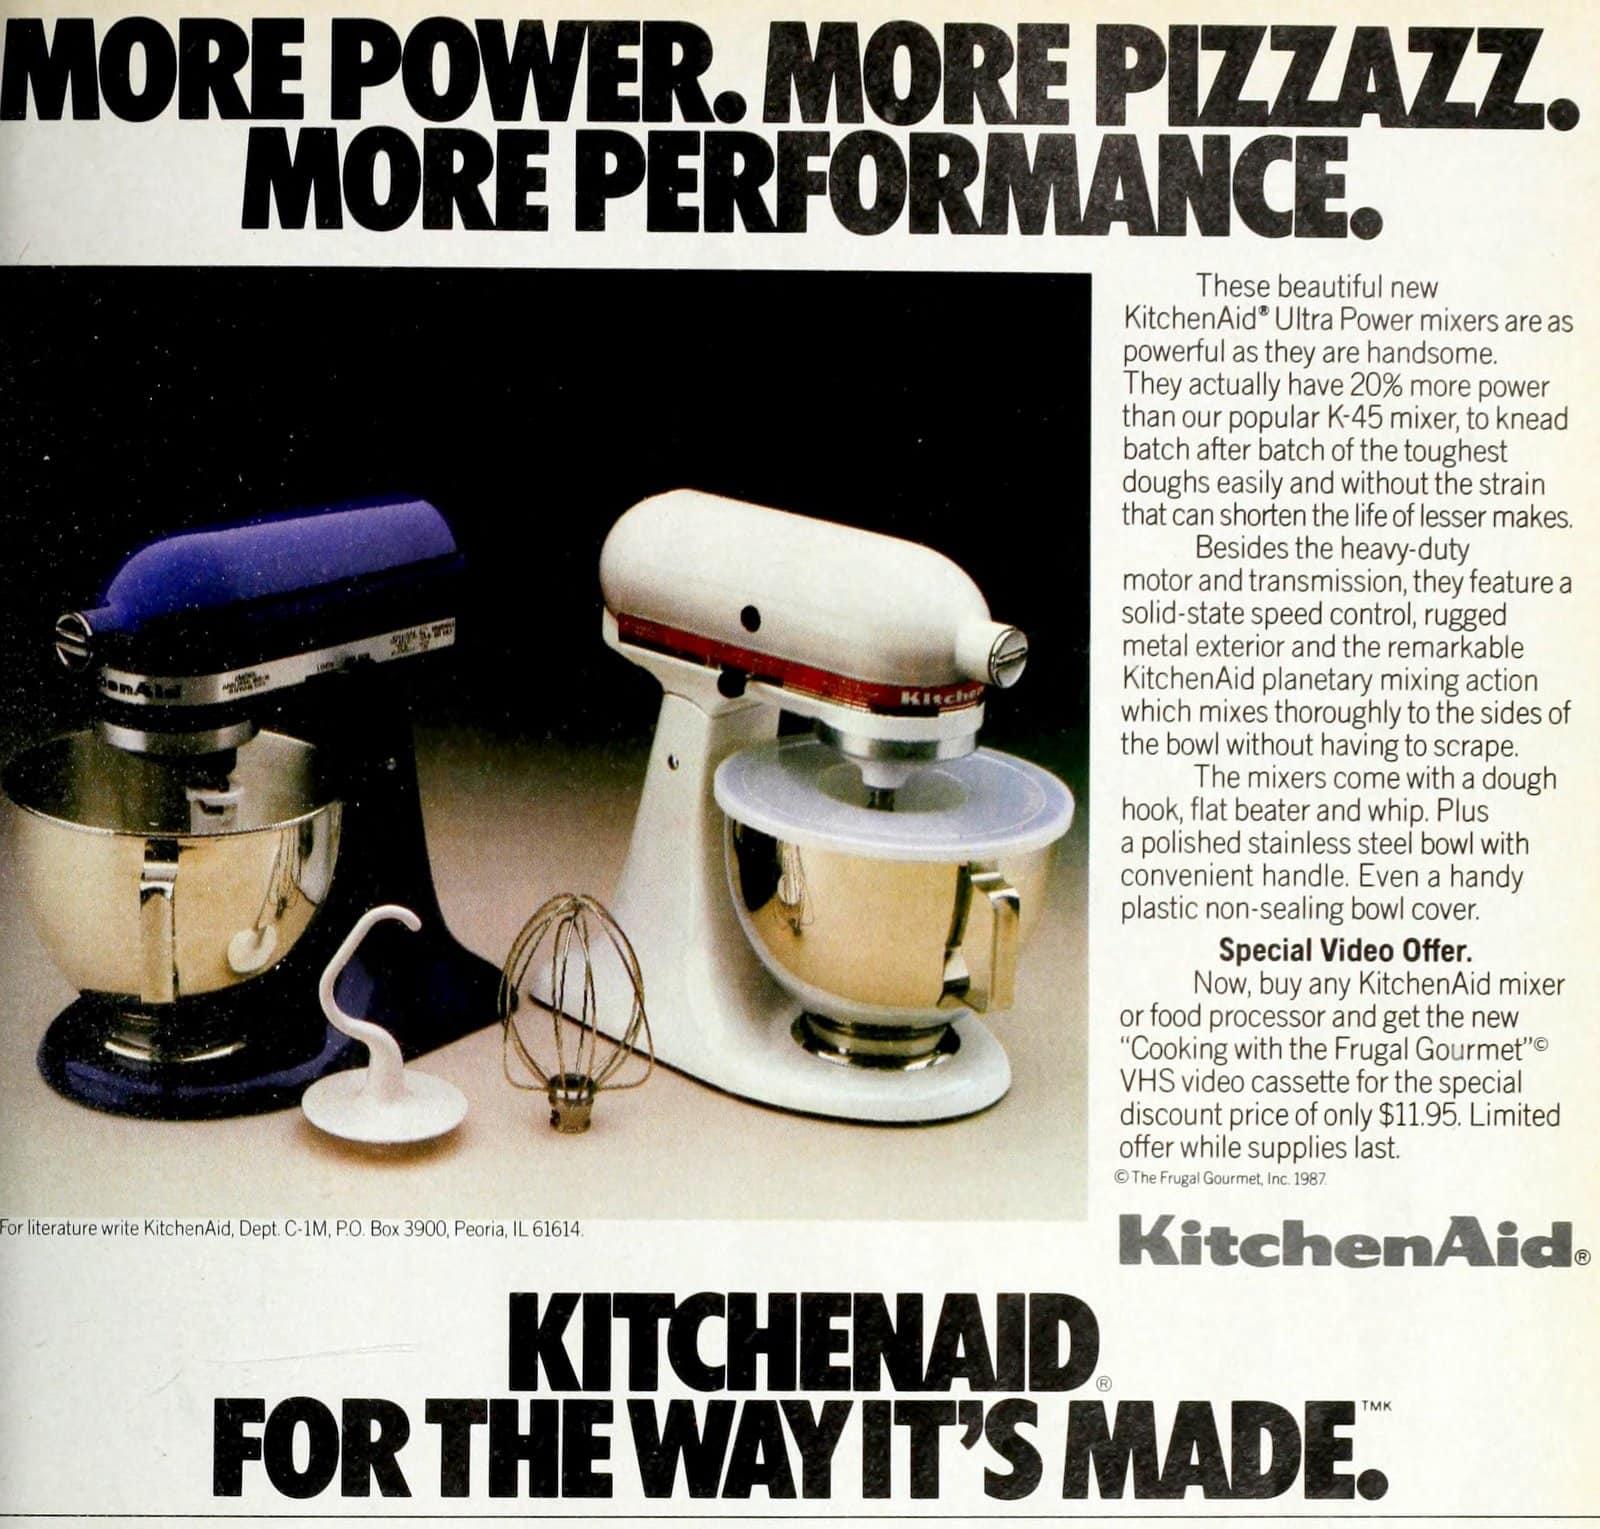 Retro 80s Kitchenaid stand mixers (1987)